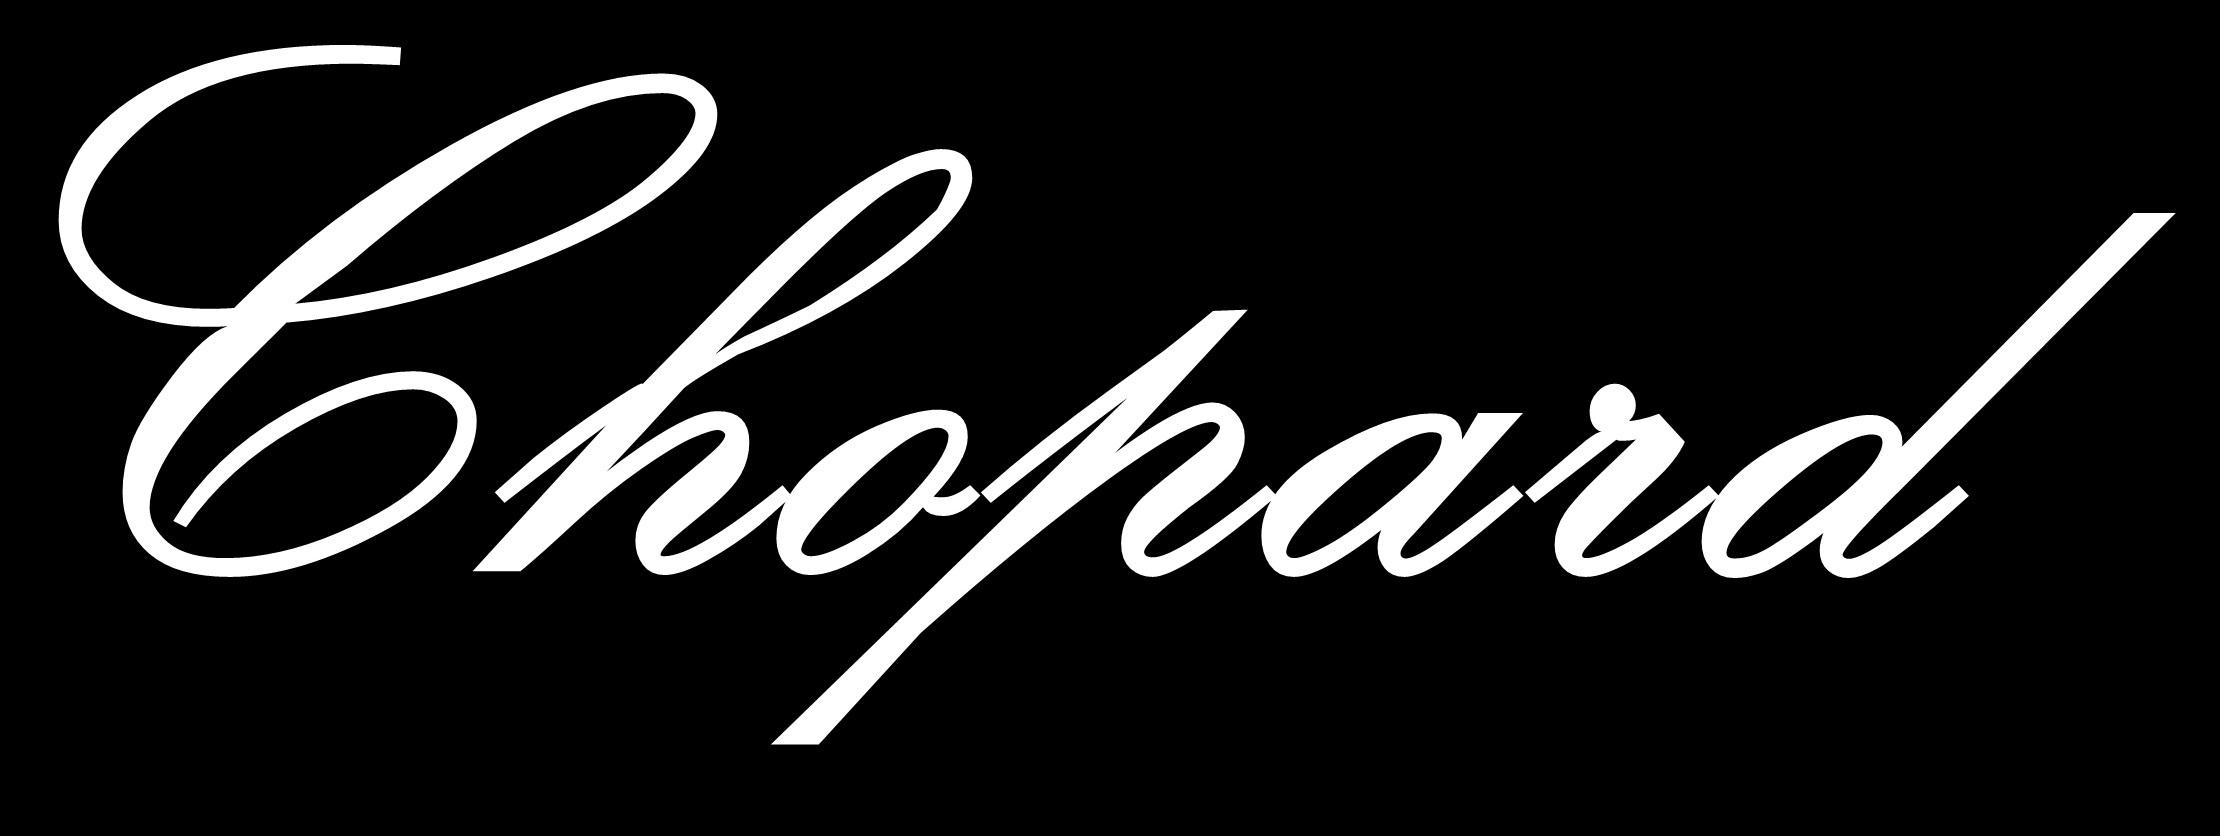 Chopard-logo-wallpaper.jpg